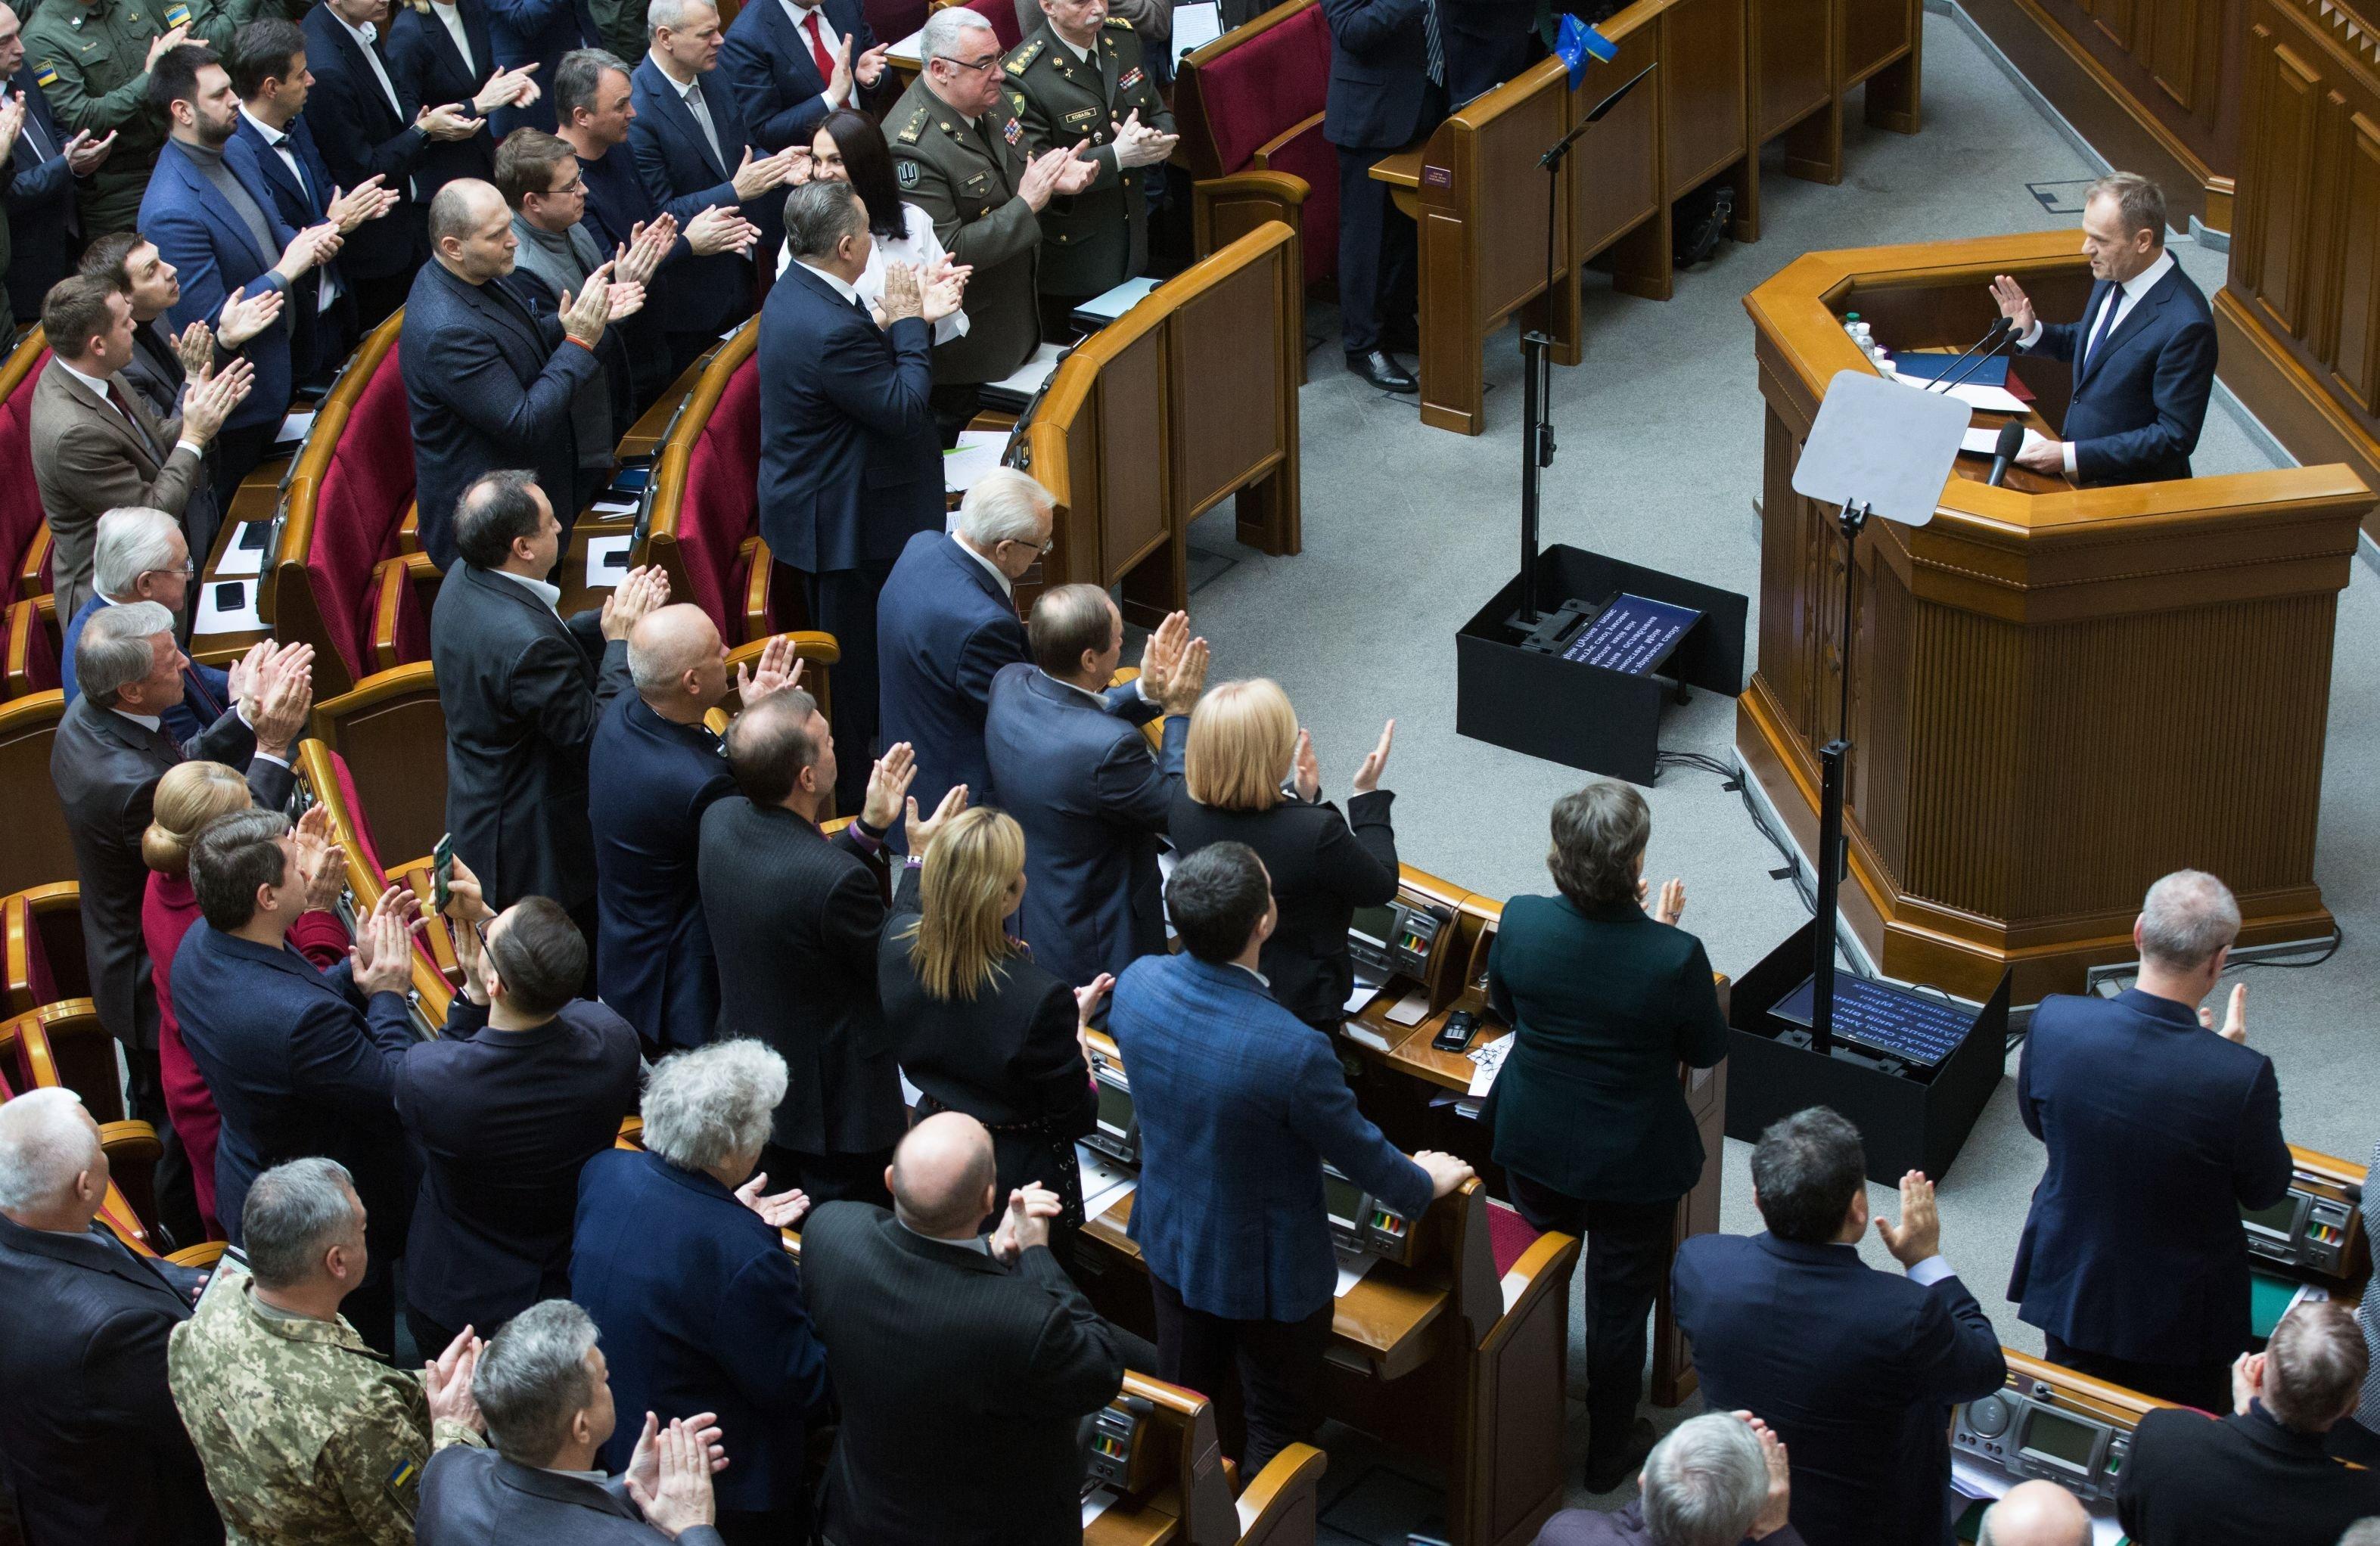 Donald Tusk. Kijów, Rada Najwyższa. Ukraina.